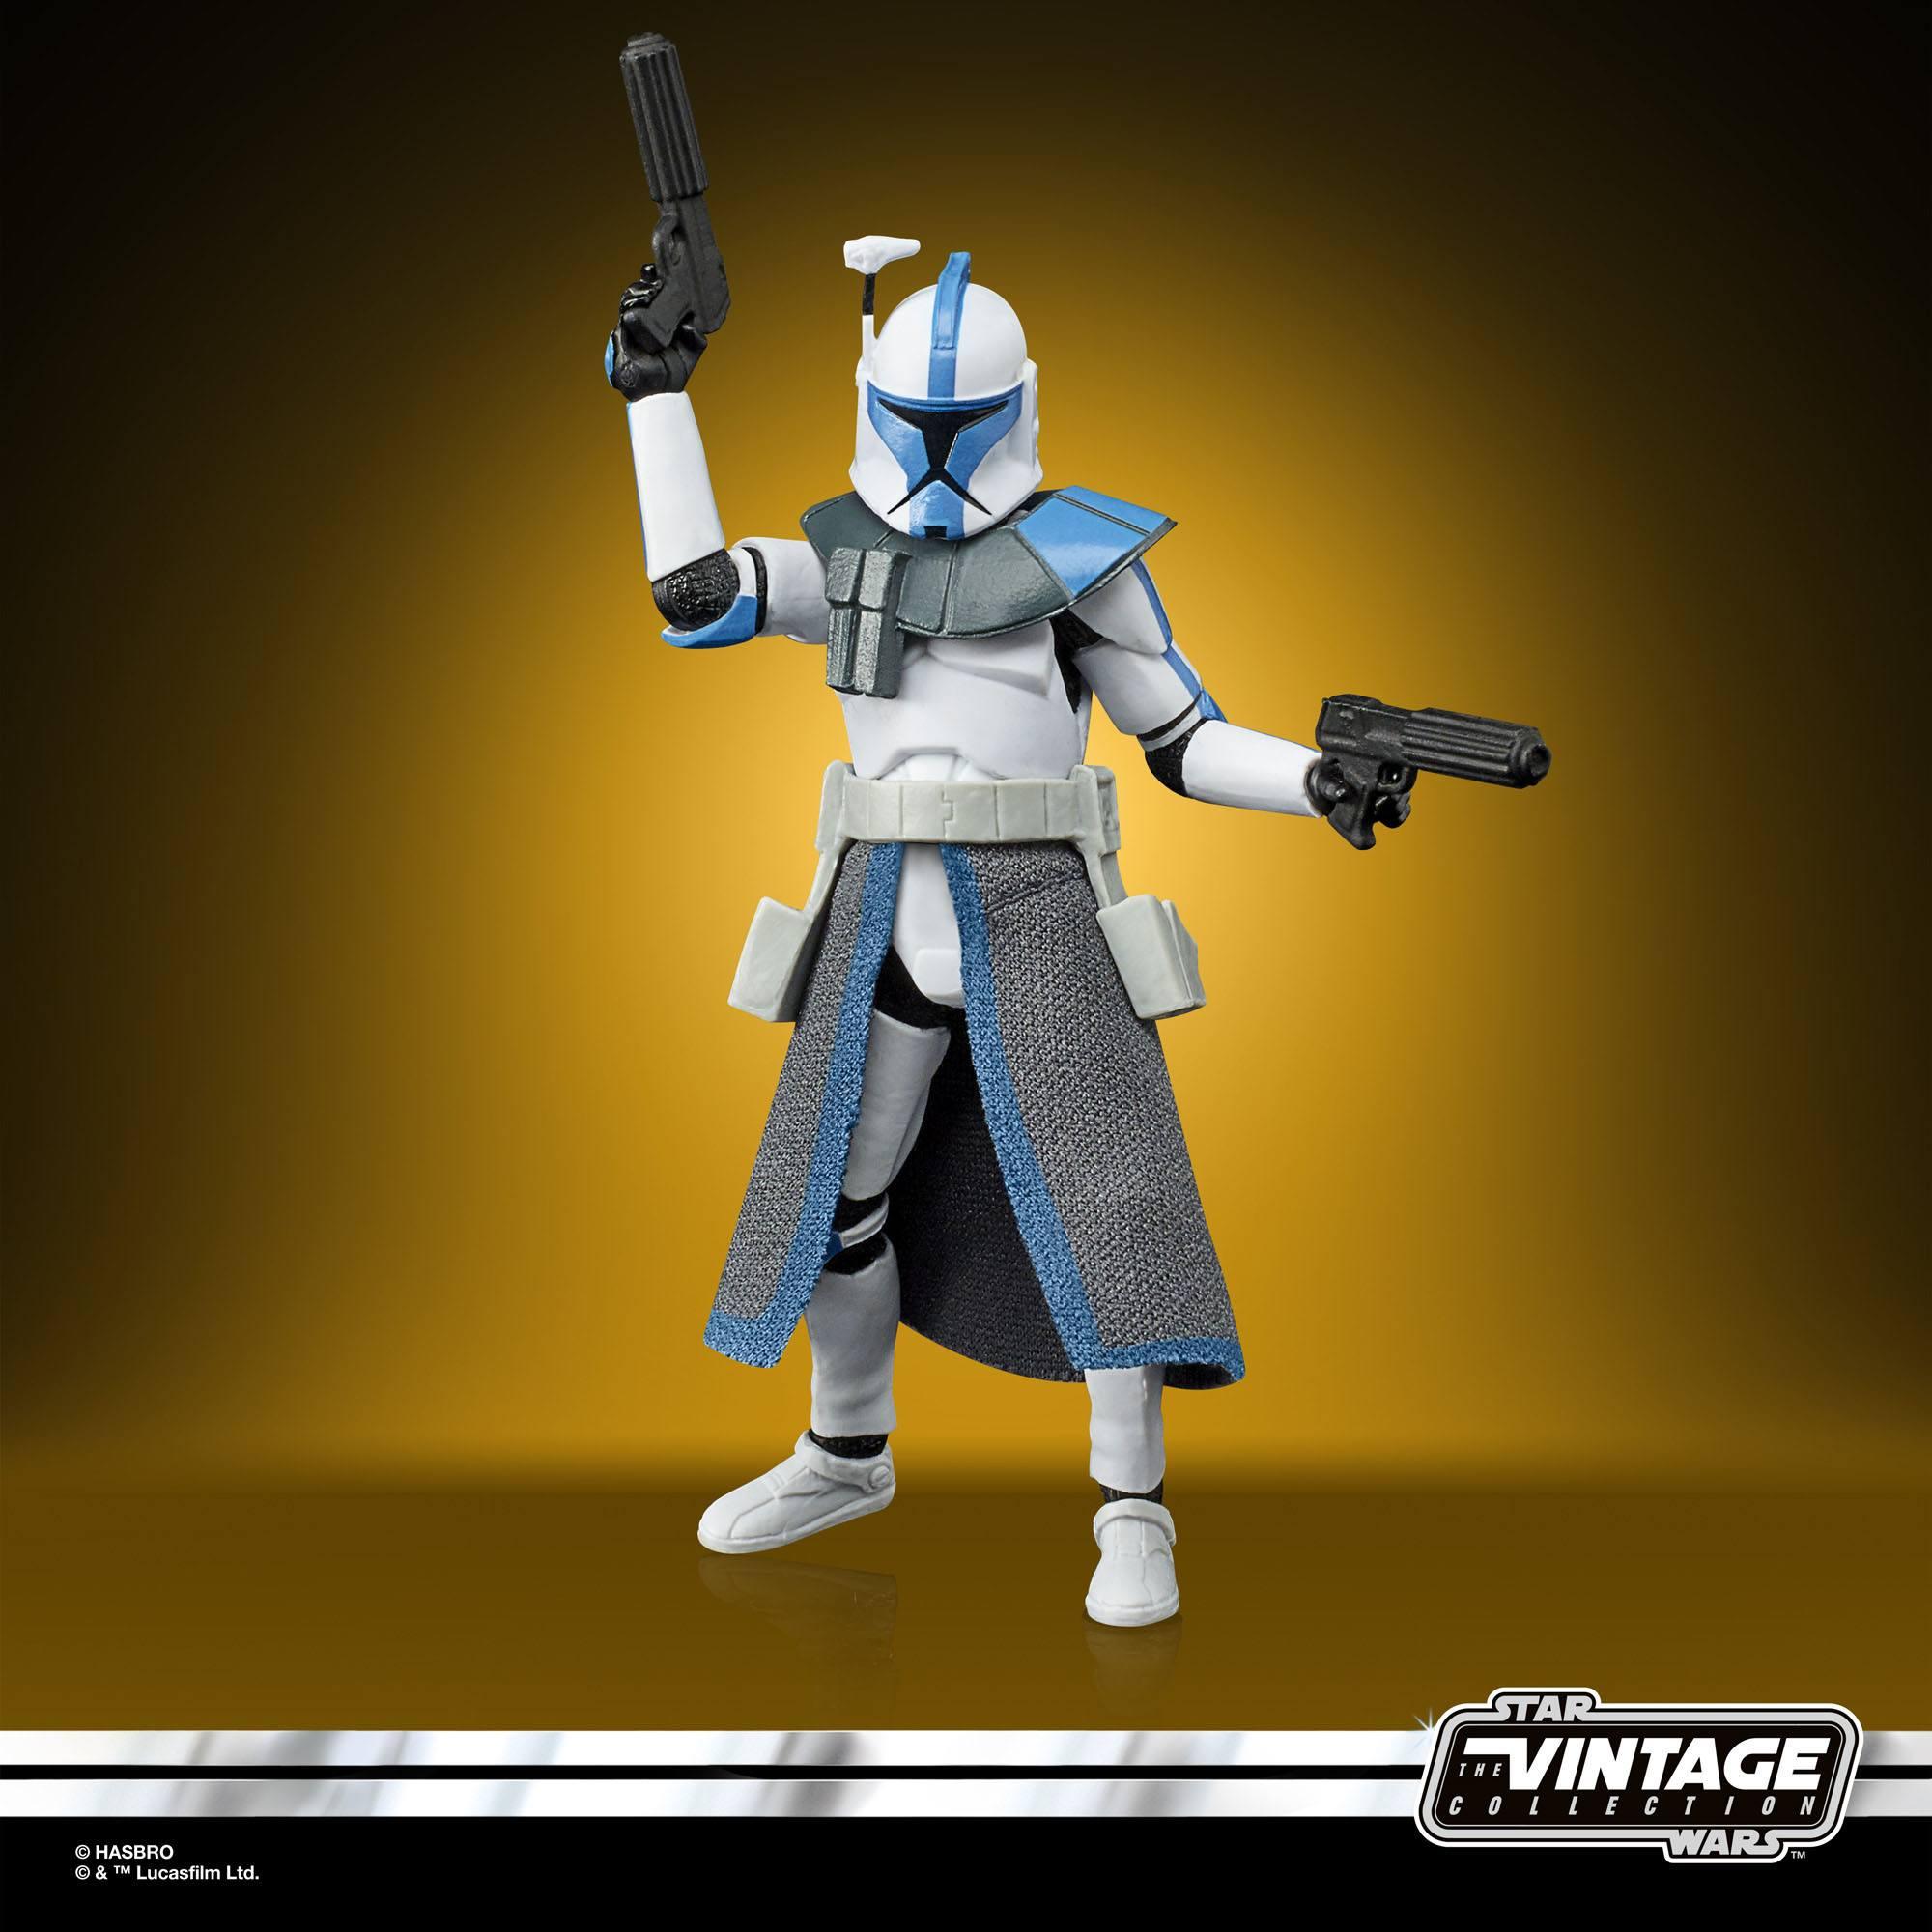 Star Wars The Clone Wars Vintage Collection Actionfigur 2022 ARC Trooper 10 cm F54195L00